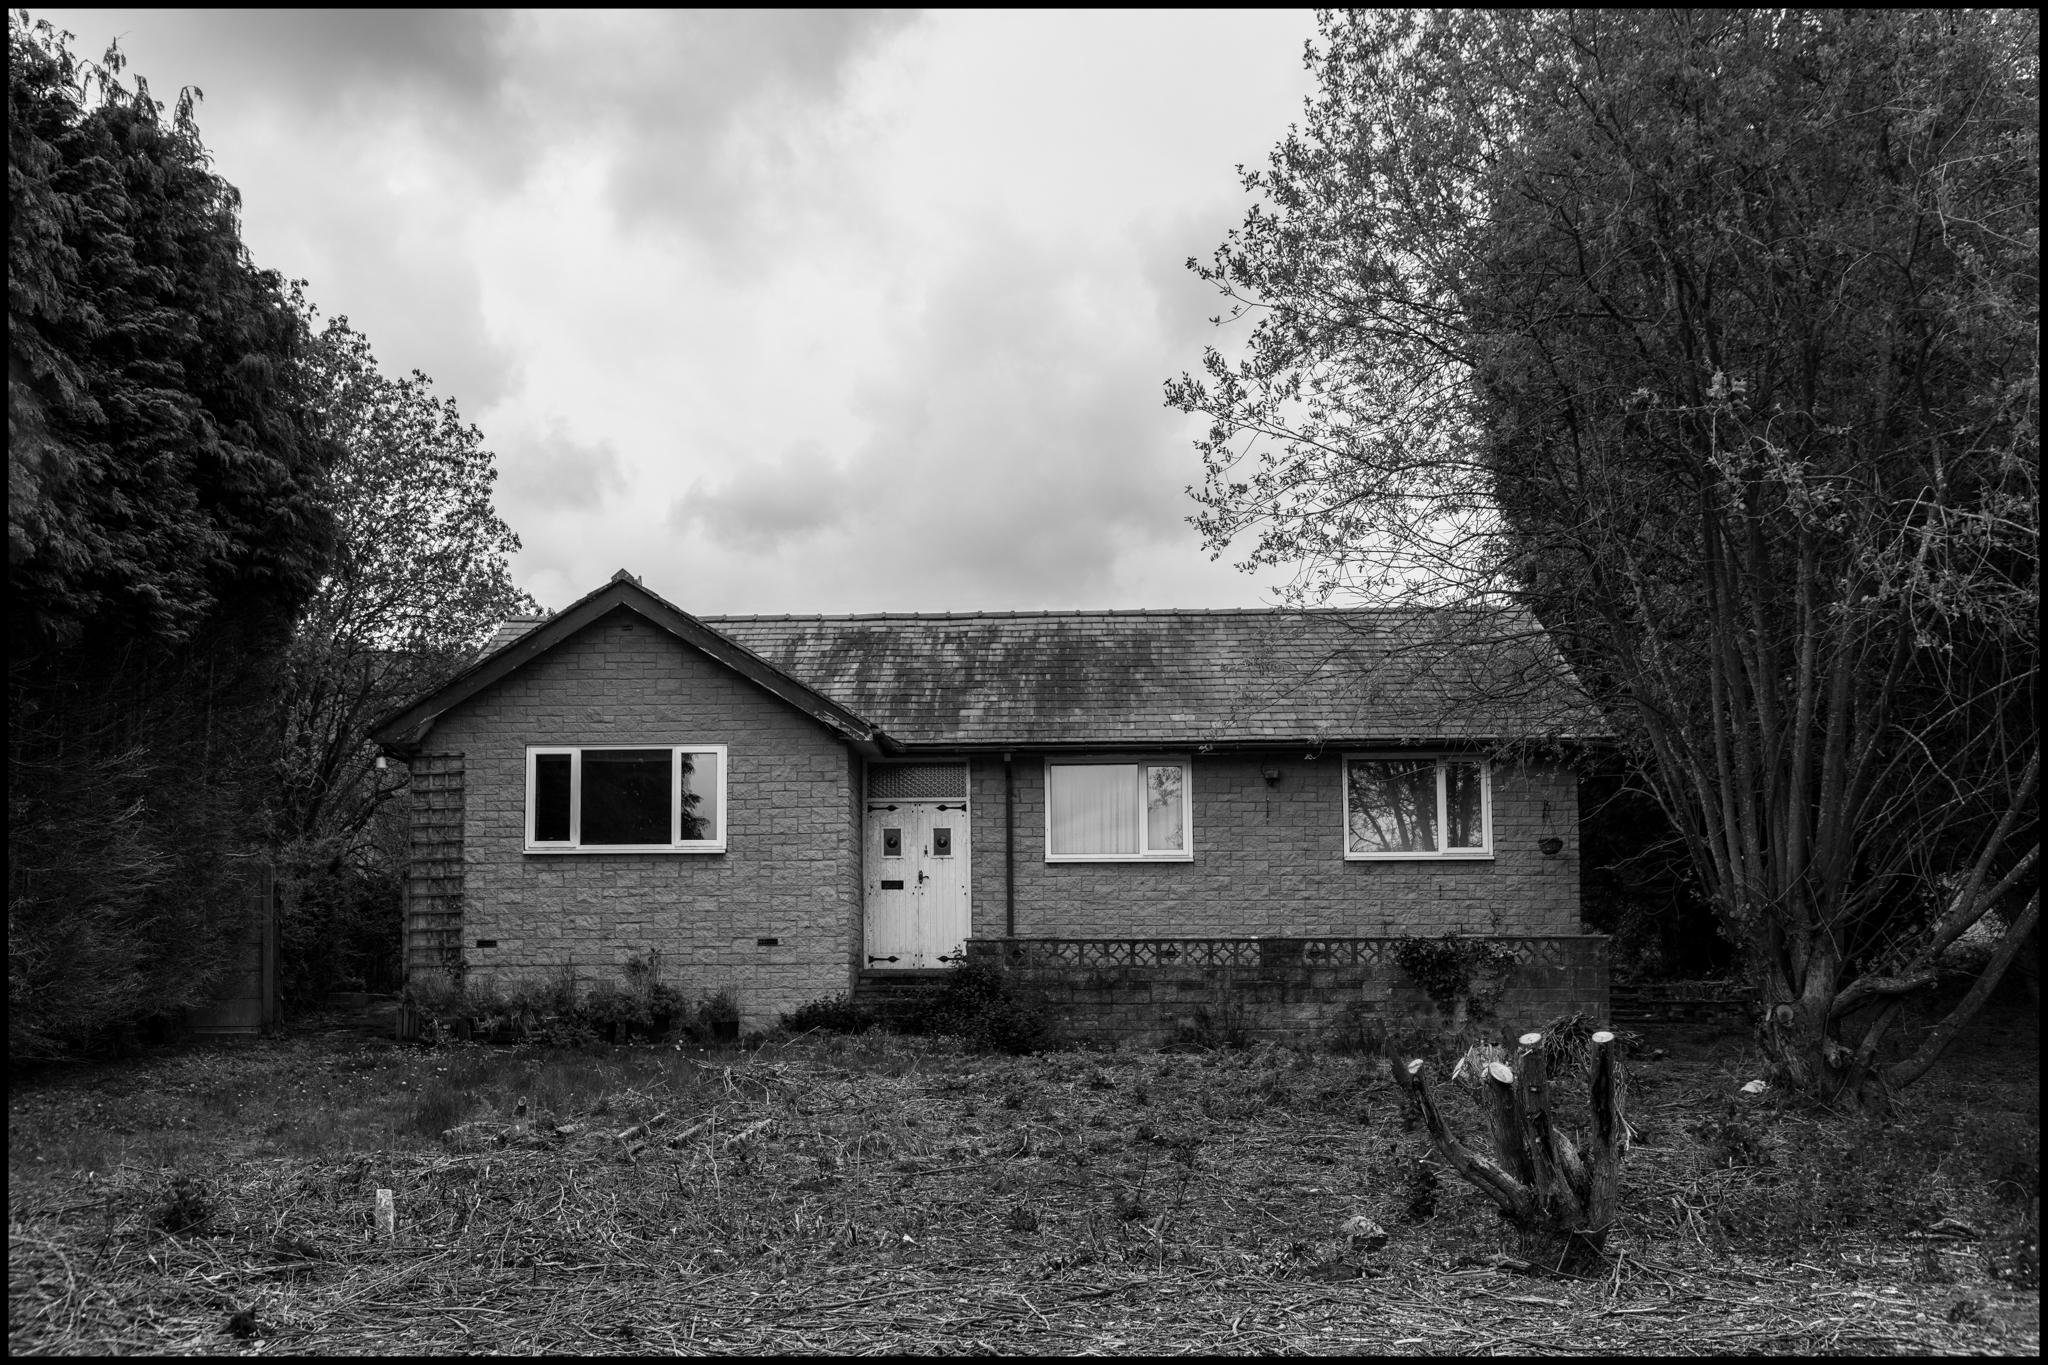 13 May 2019 - Farm house, New Mills UK